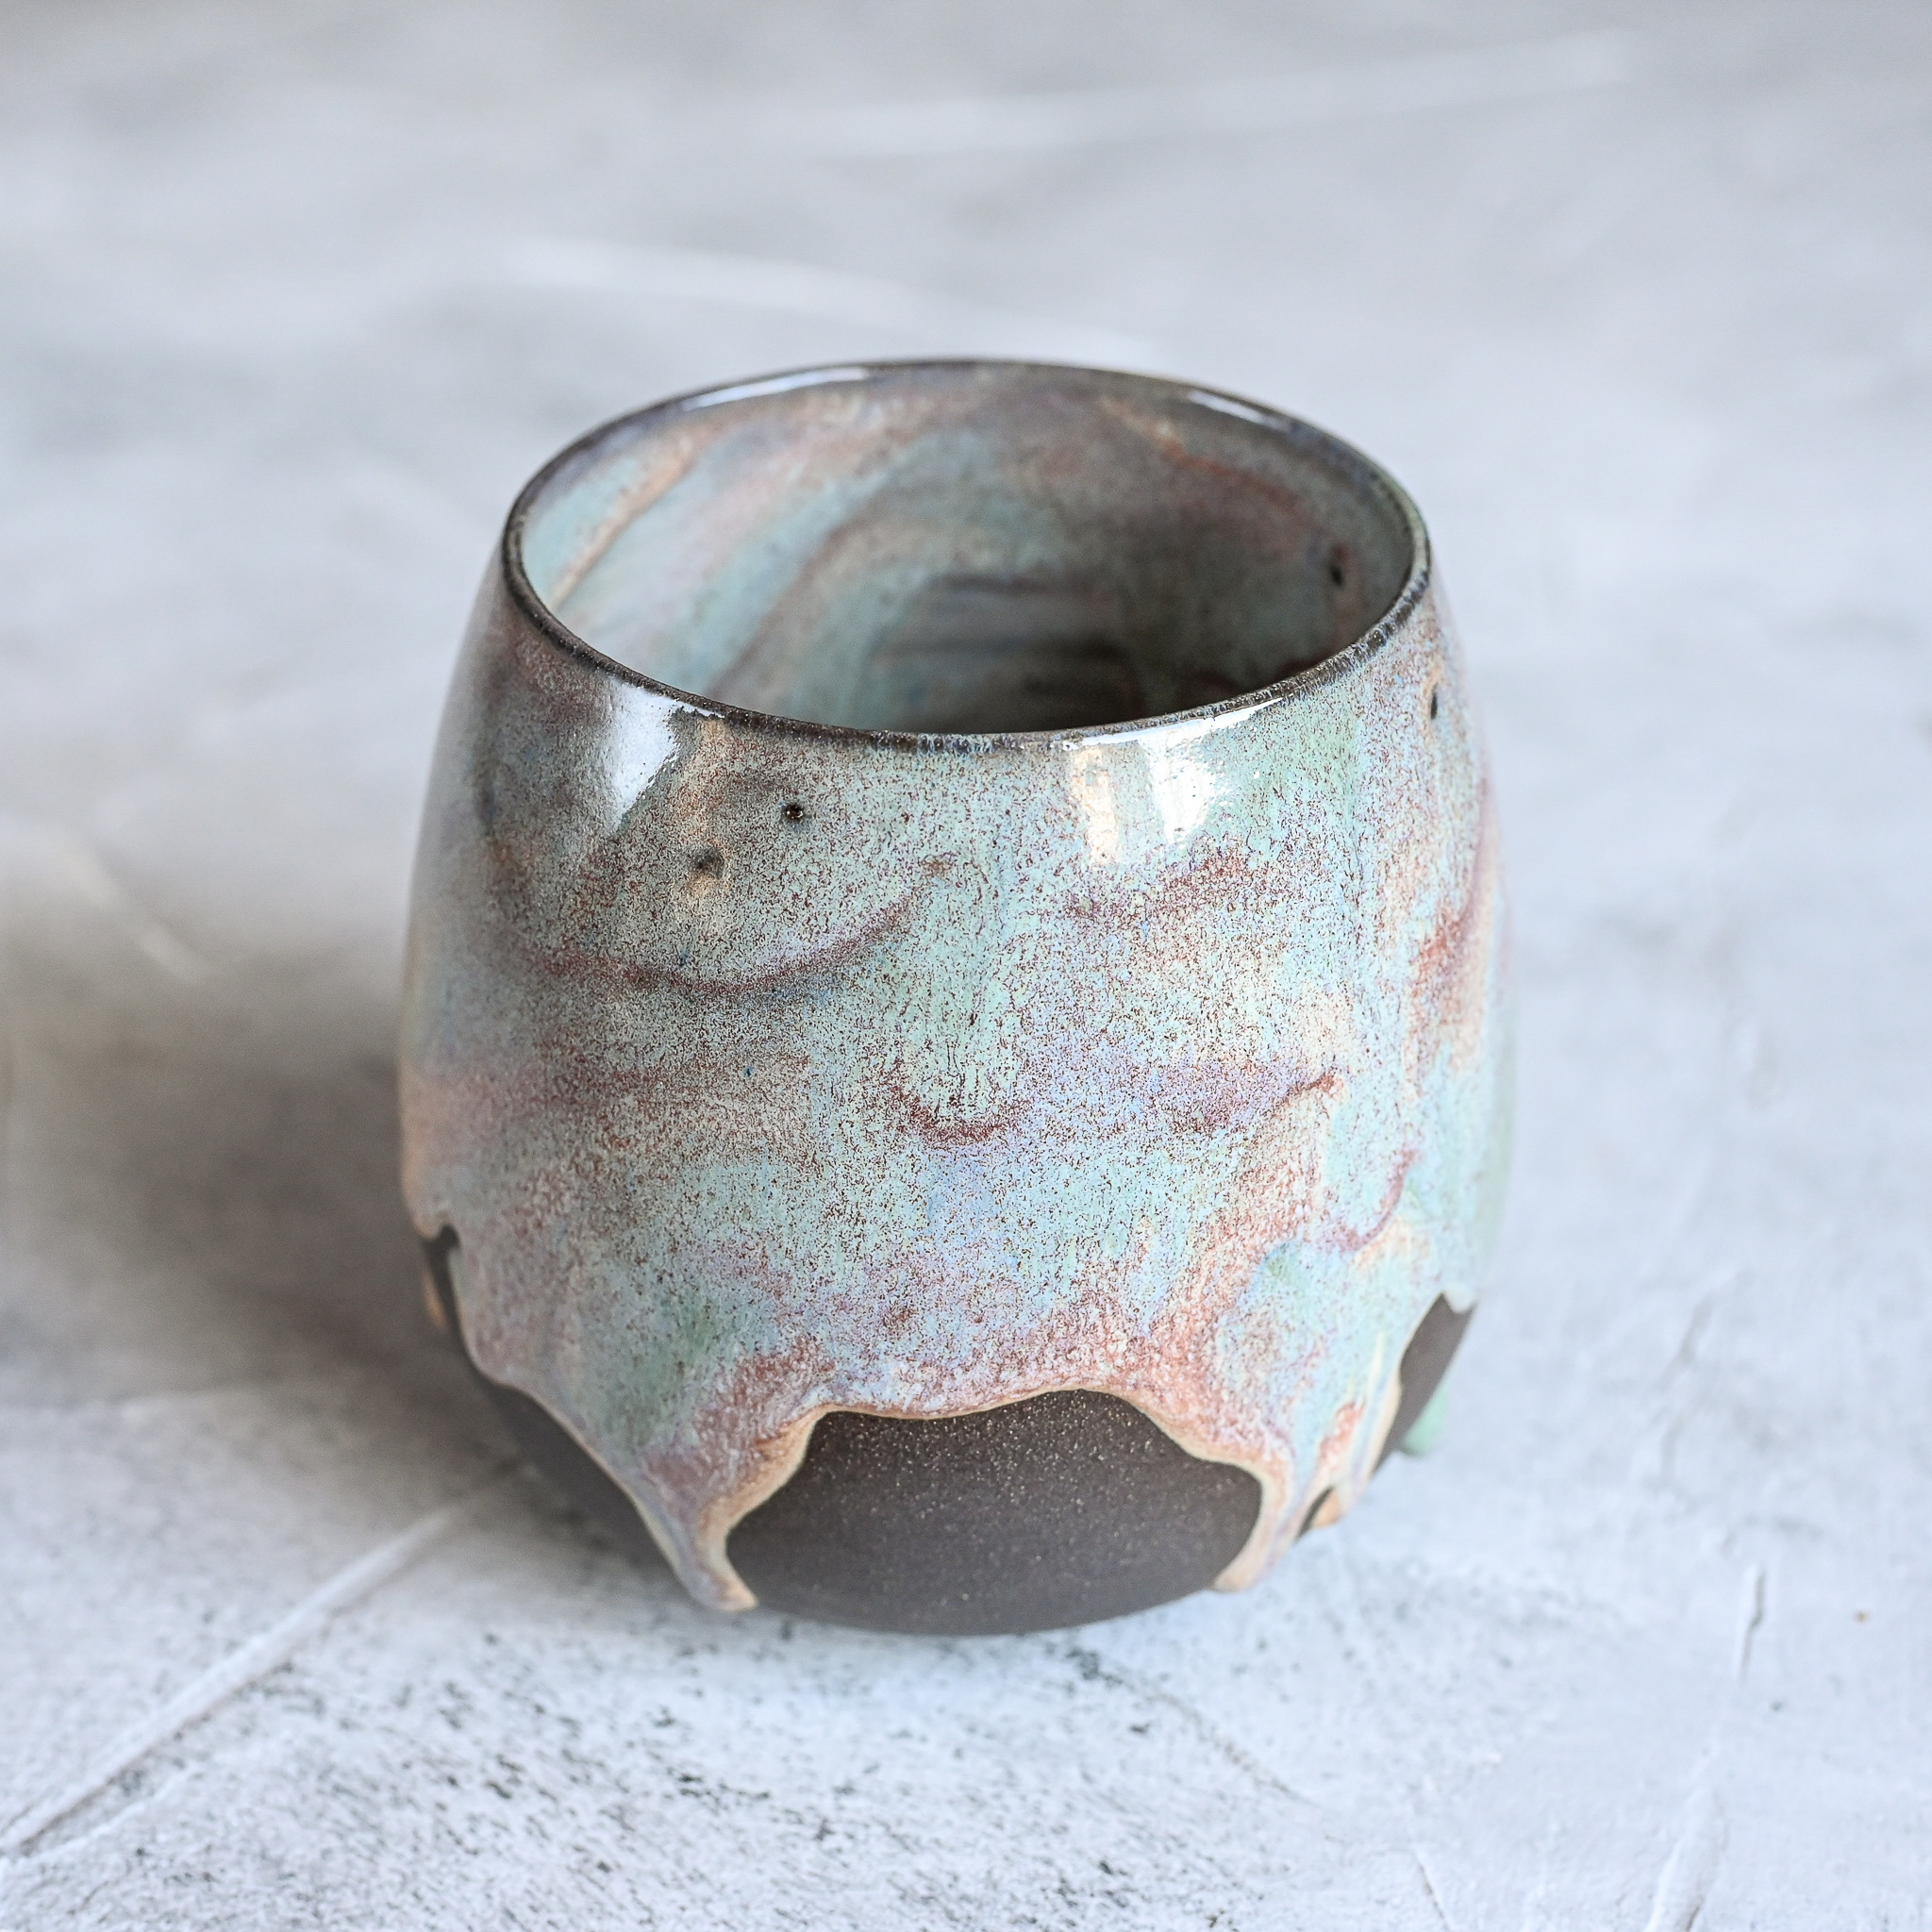 картинка Керамический стакан Марии Левиной 10 - DishWishes.Ru